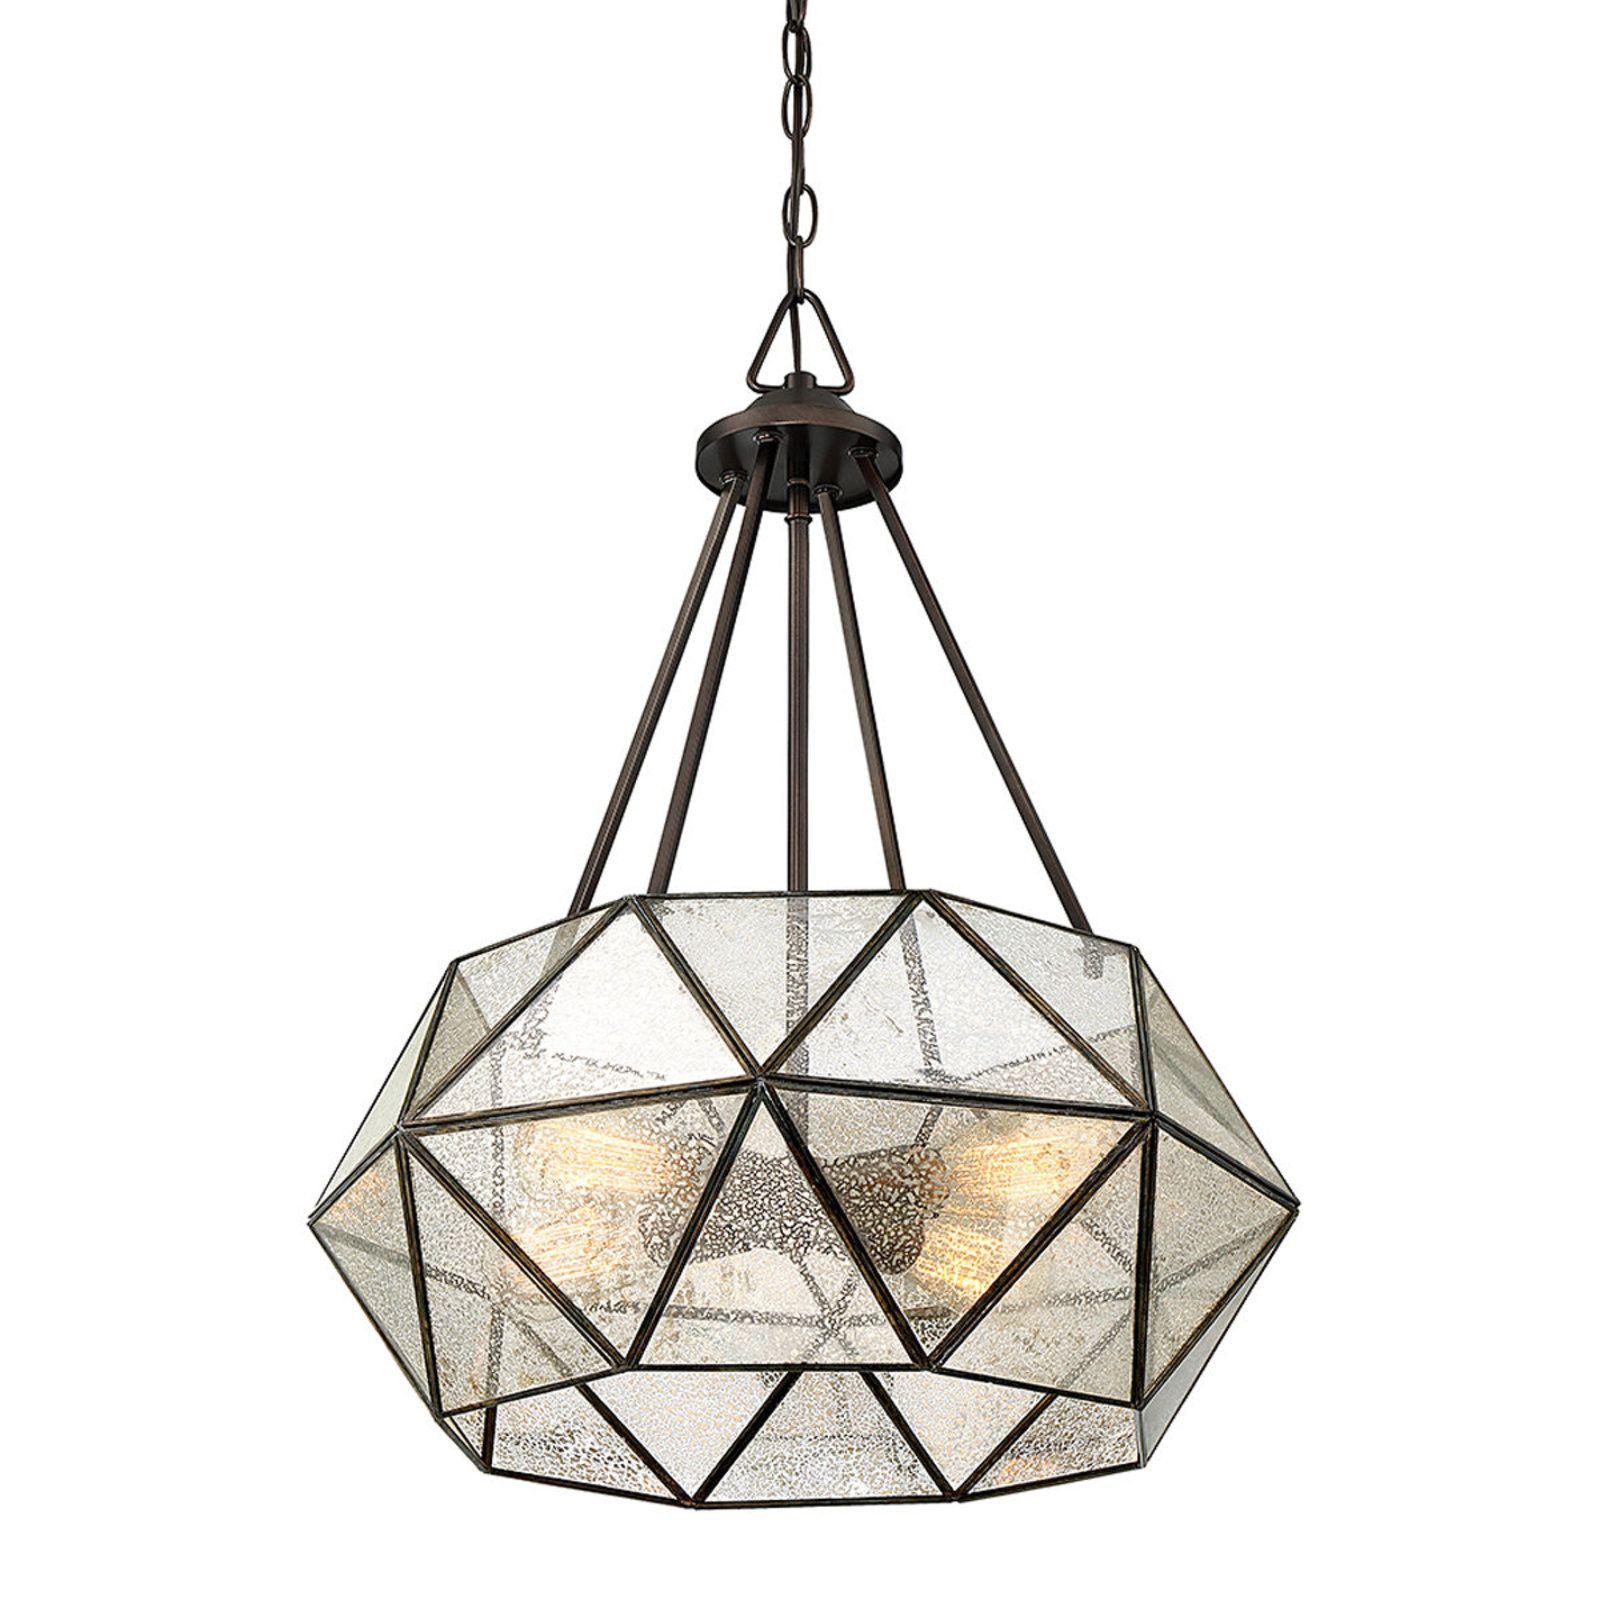 magnificent glass lighting throughout lights light design ceiling fixtures fancy popular image mercury chandeliers pendant